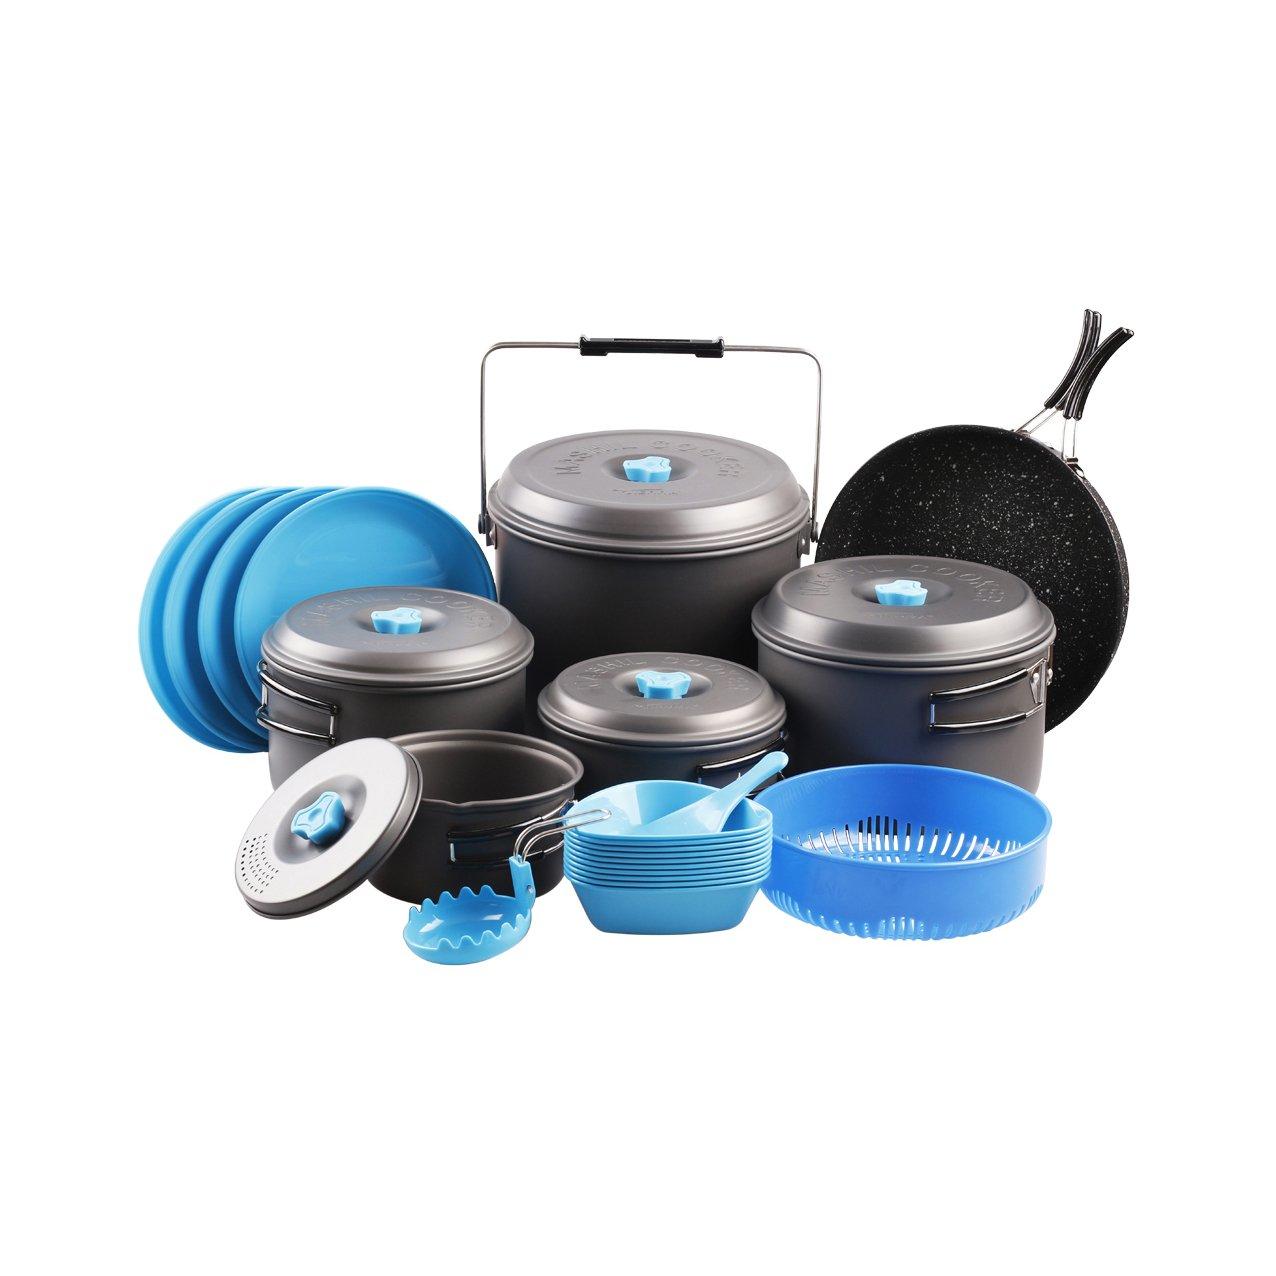 Tierra Aluminum Outdoor Camping Cookware Bowl Pot Pan Set Mess Kit For 11 Persons